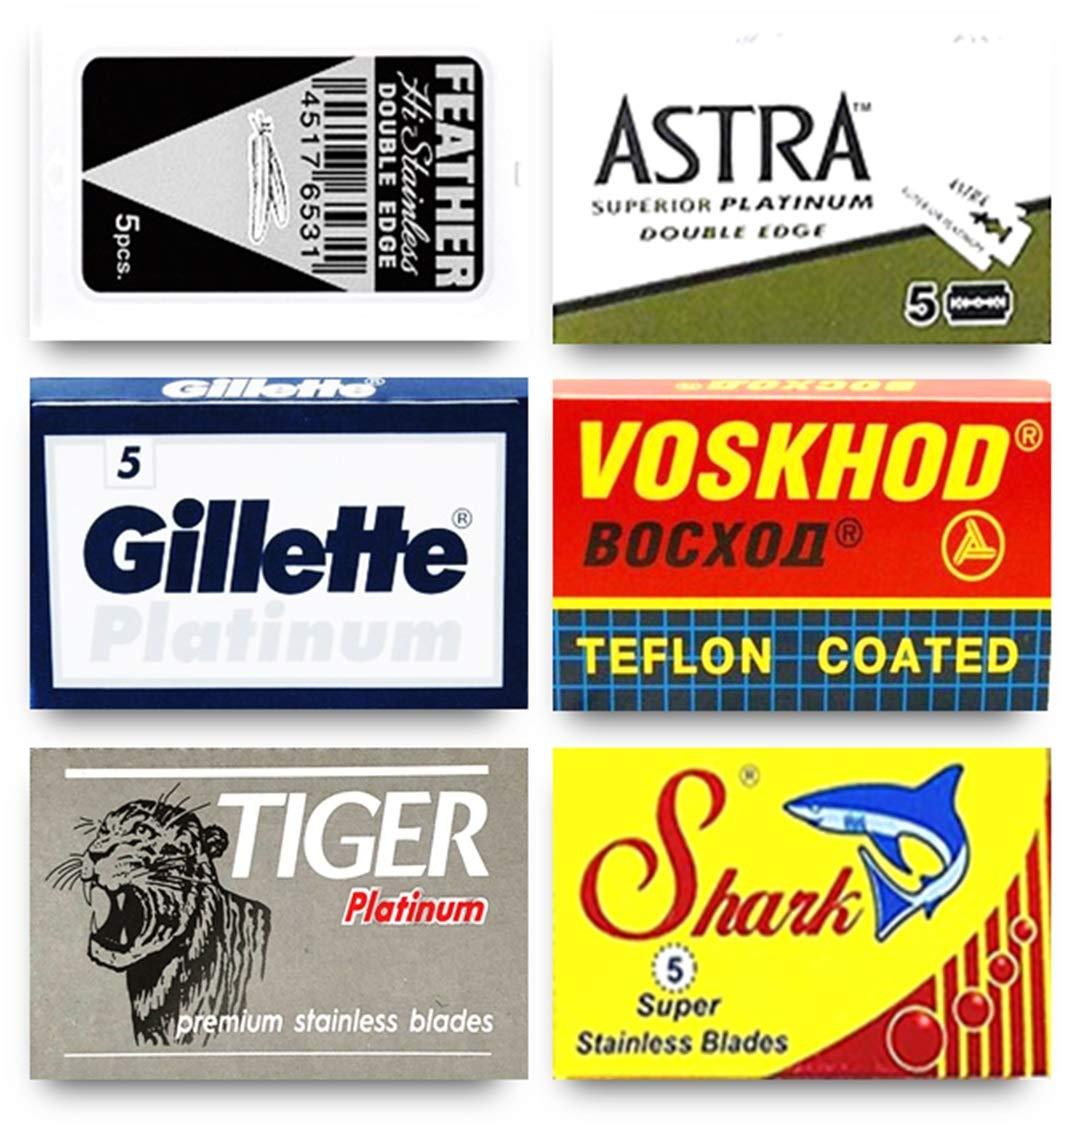 Astra-Feather-Shark-Tiger-Voskhod Double Edge Razor Blades Sampler, 30 Blades